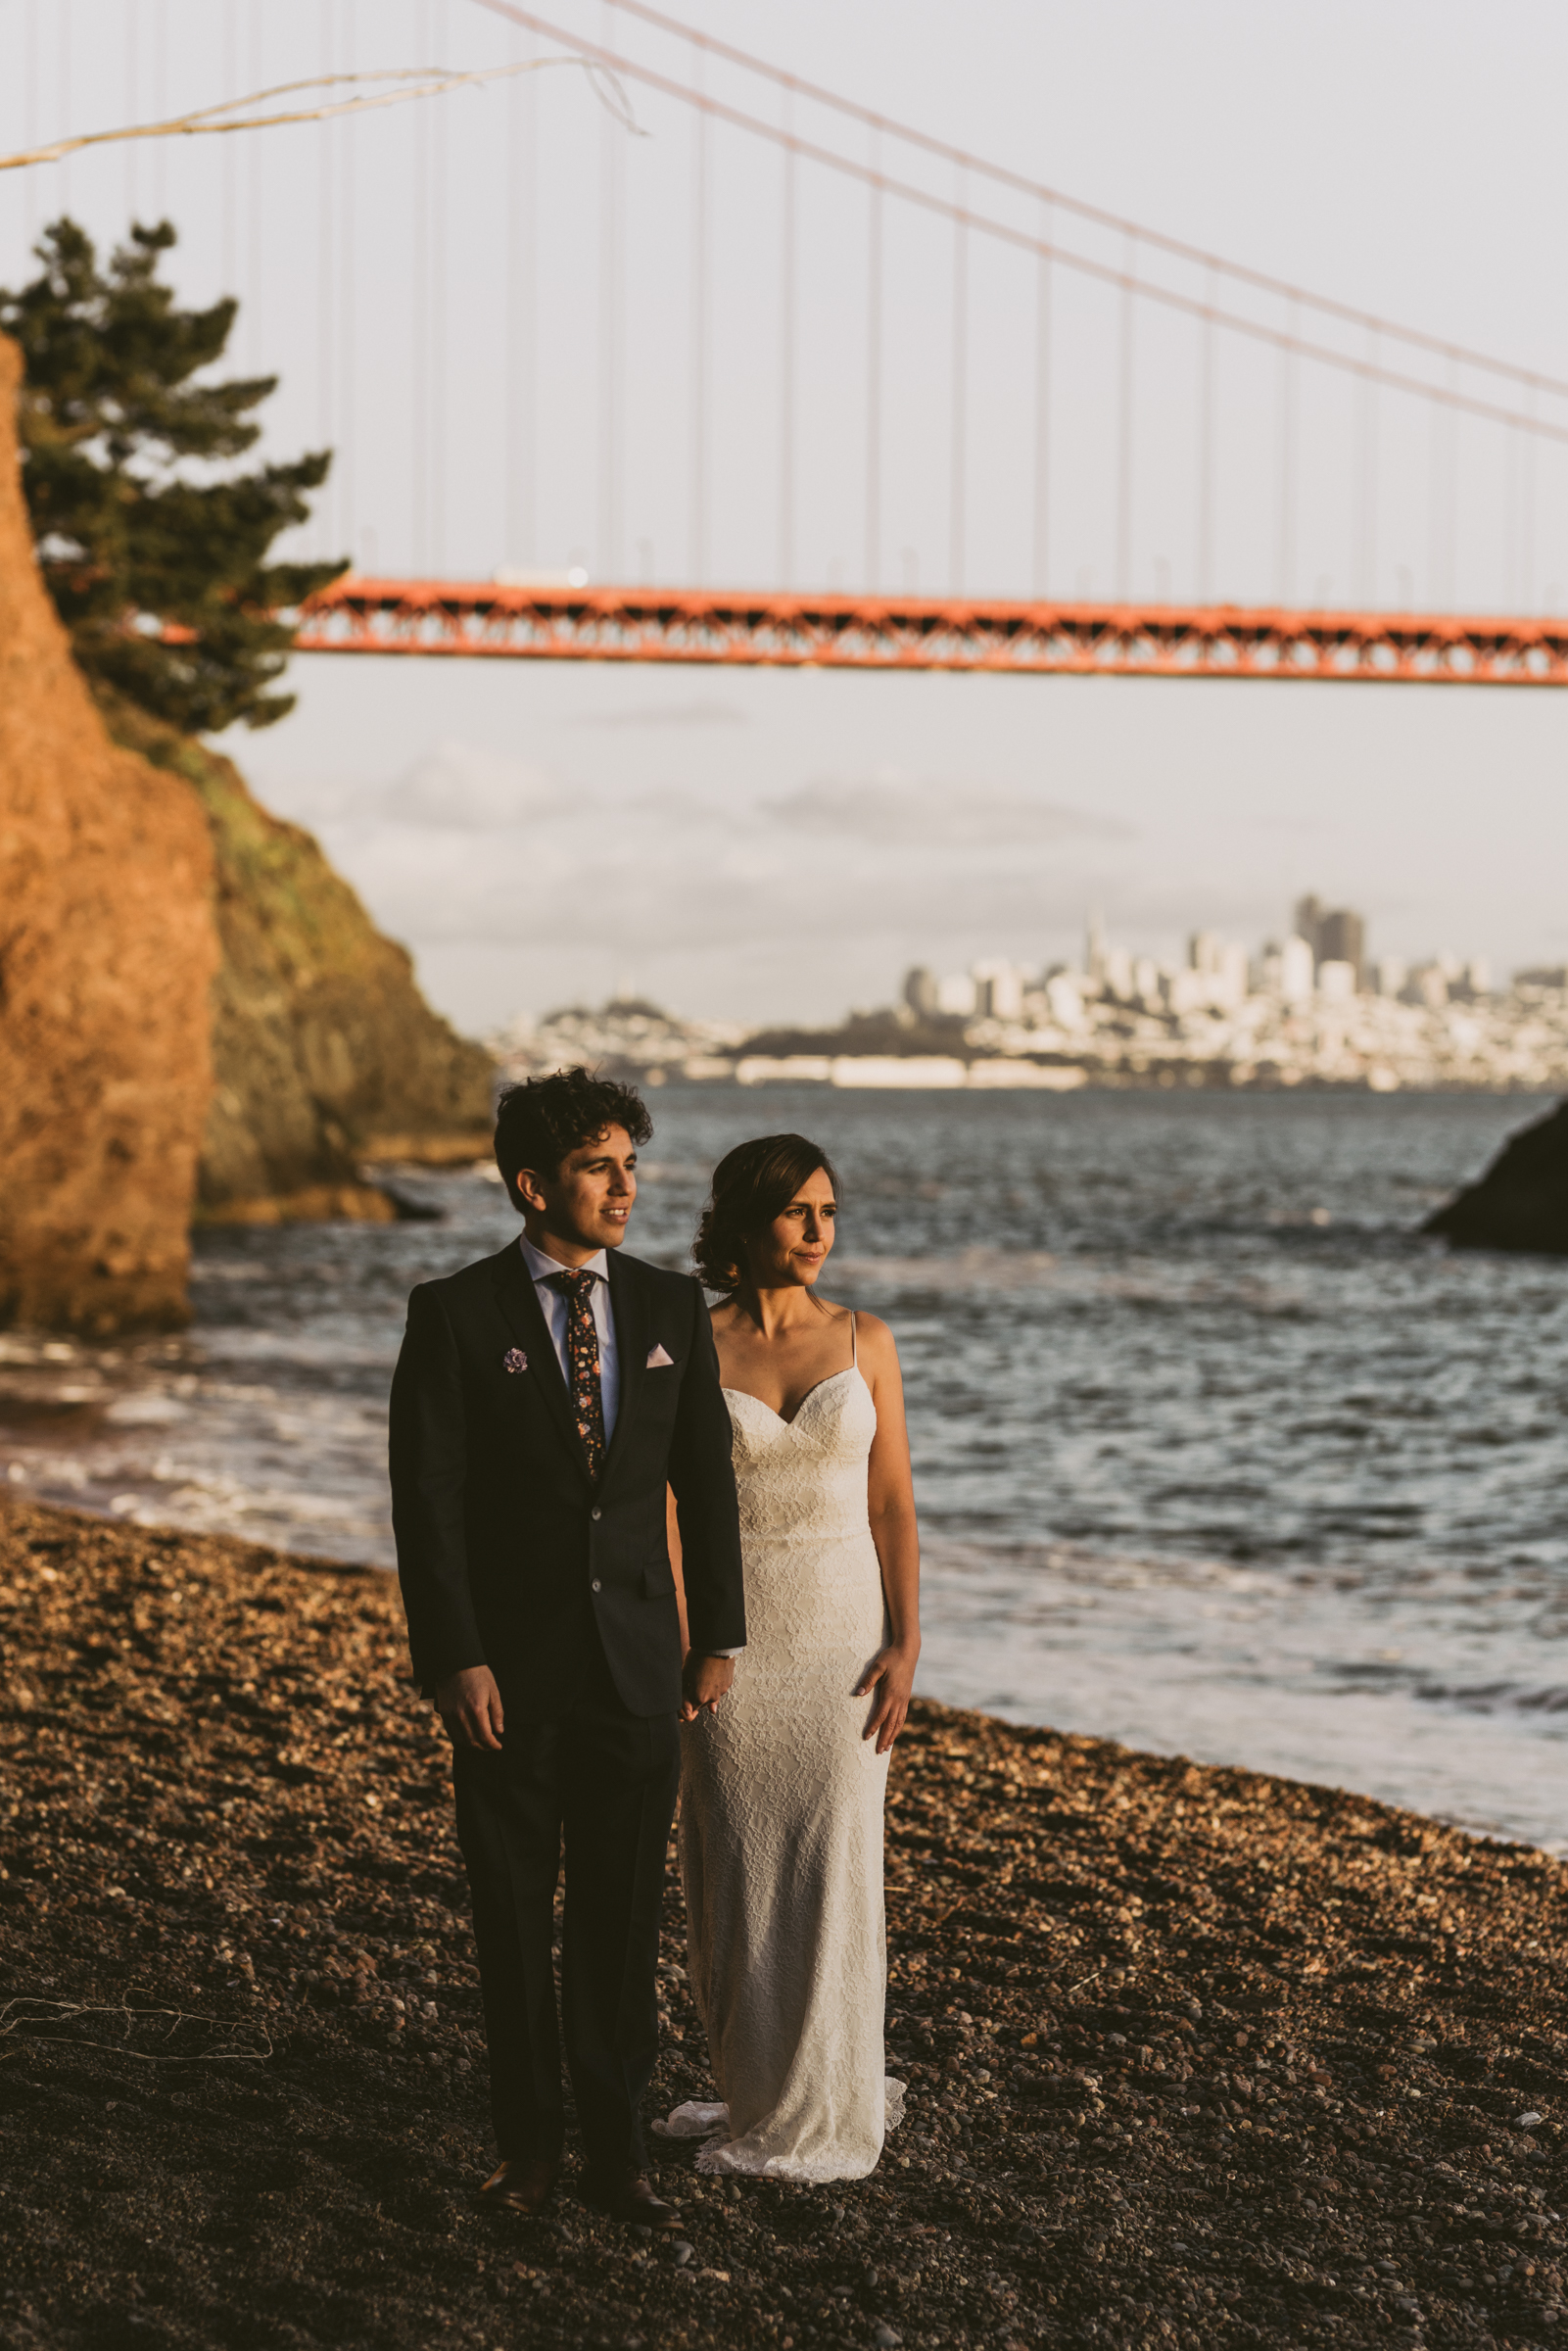 ©Isaiah + Taylor Photography - San Fransisco Elopement, Golden Gate Bridge-80.jpg